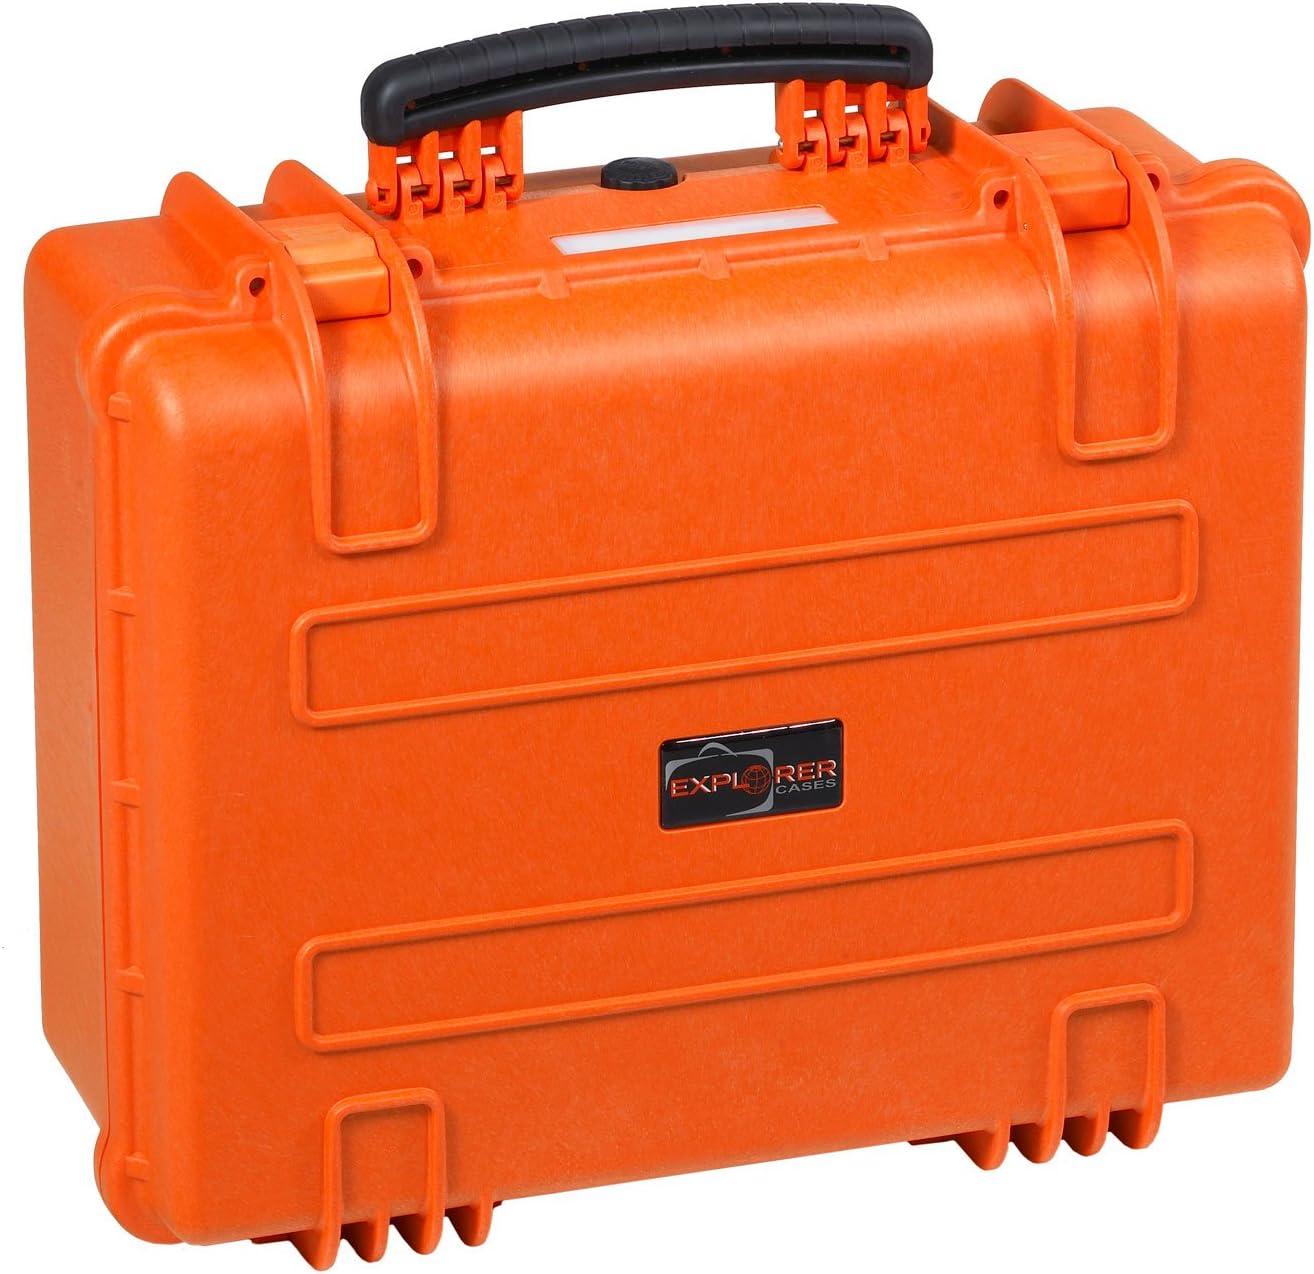 Explorer Cases 4820 OE Waterproof Dustproof Multi-Purpose Protective Case Empty Orange